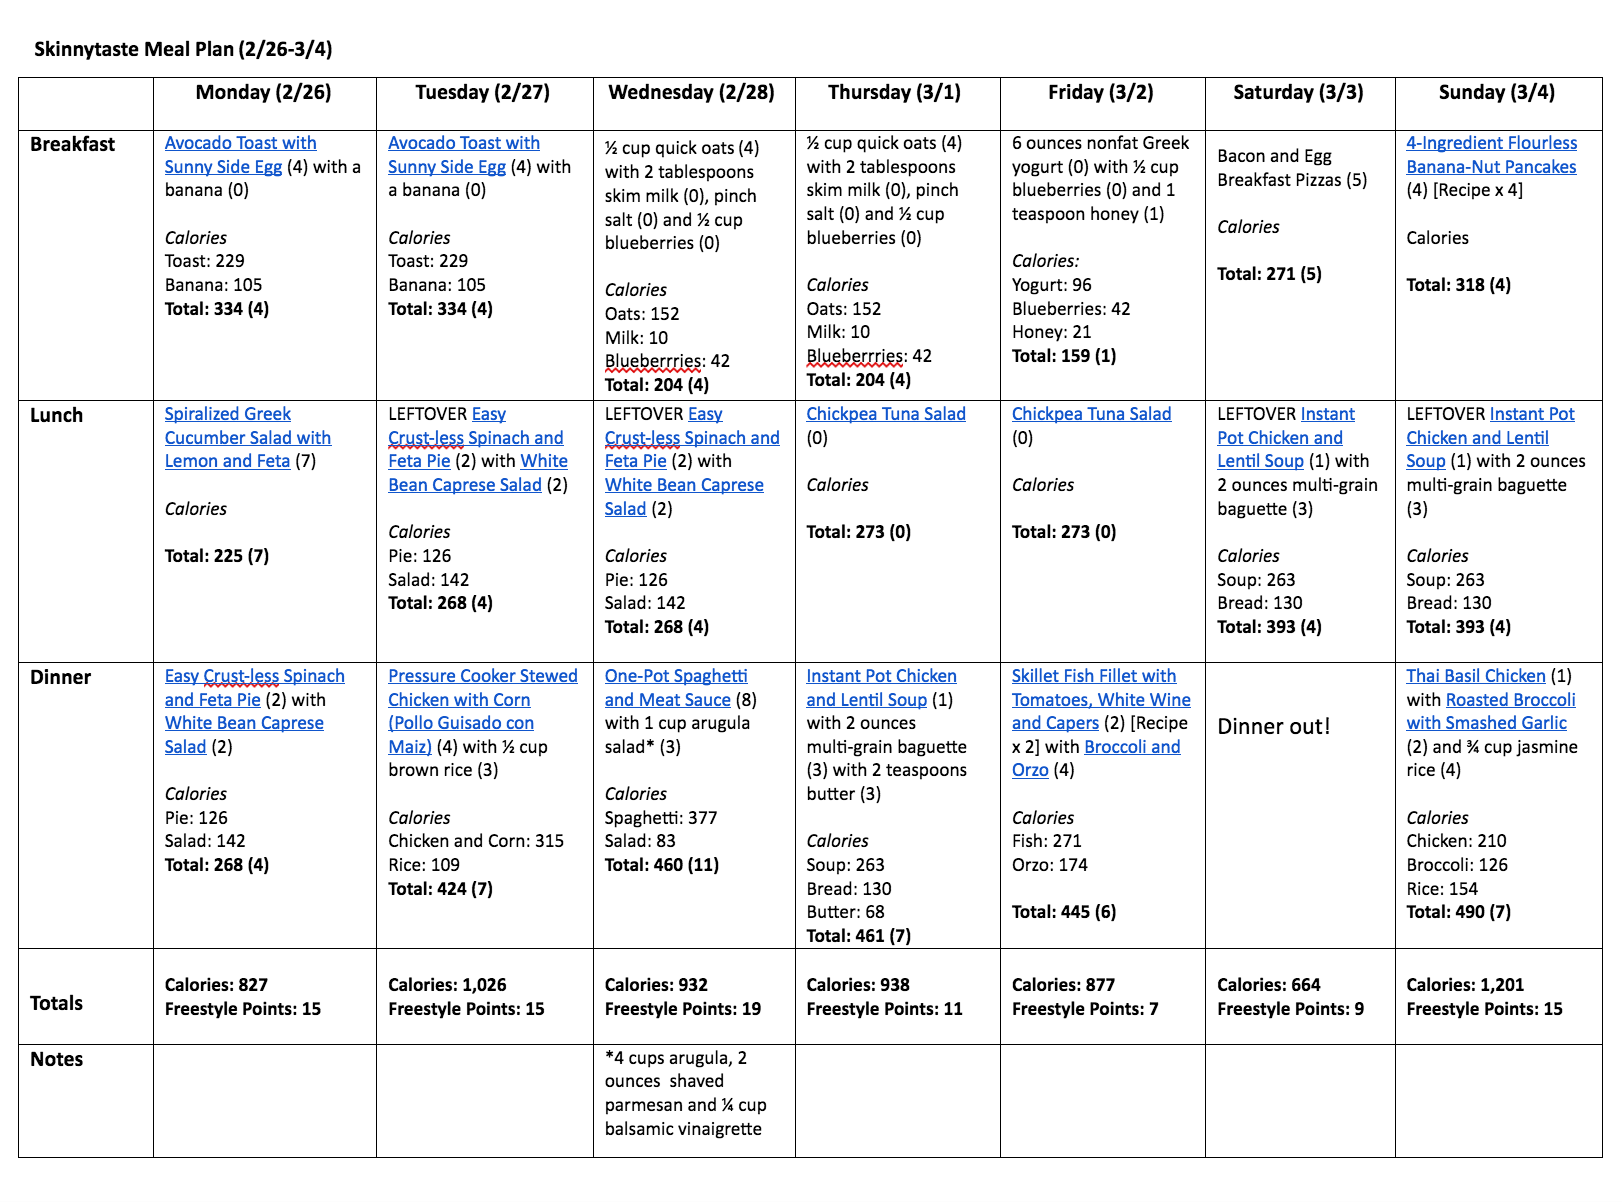 Skinnytaste Meal Plan (February 26-March 4)